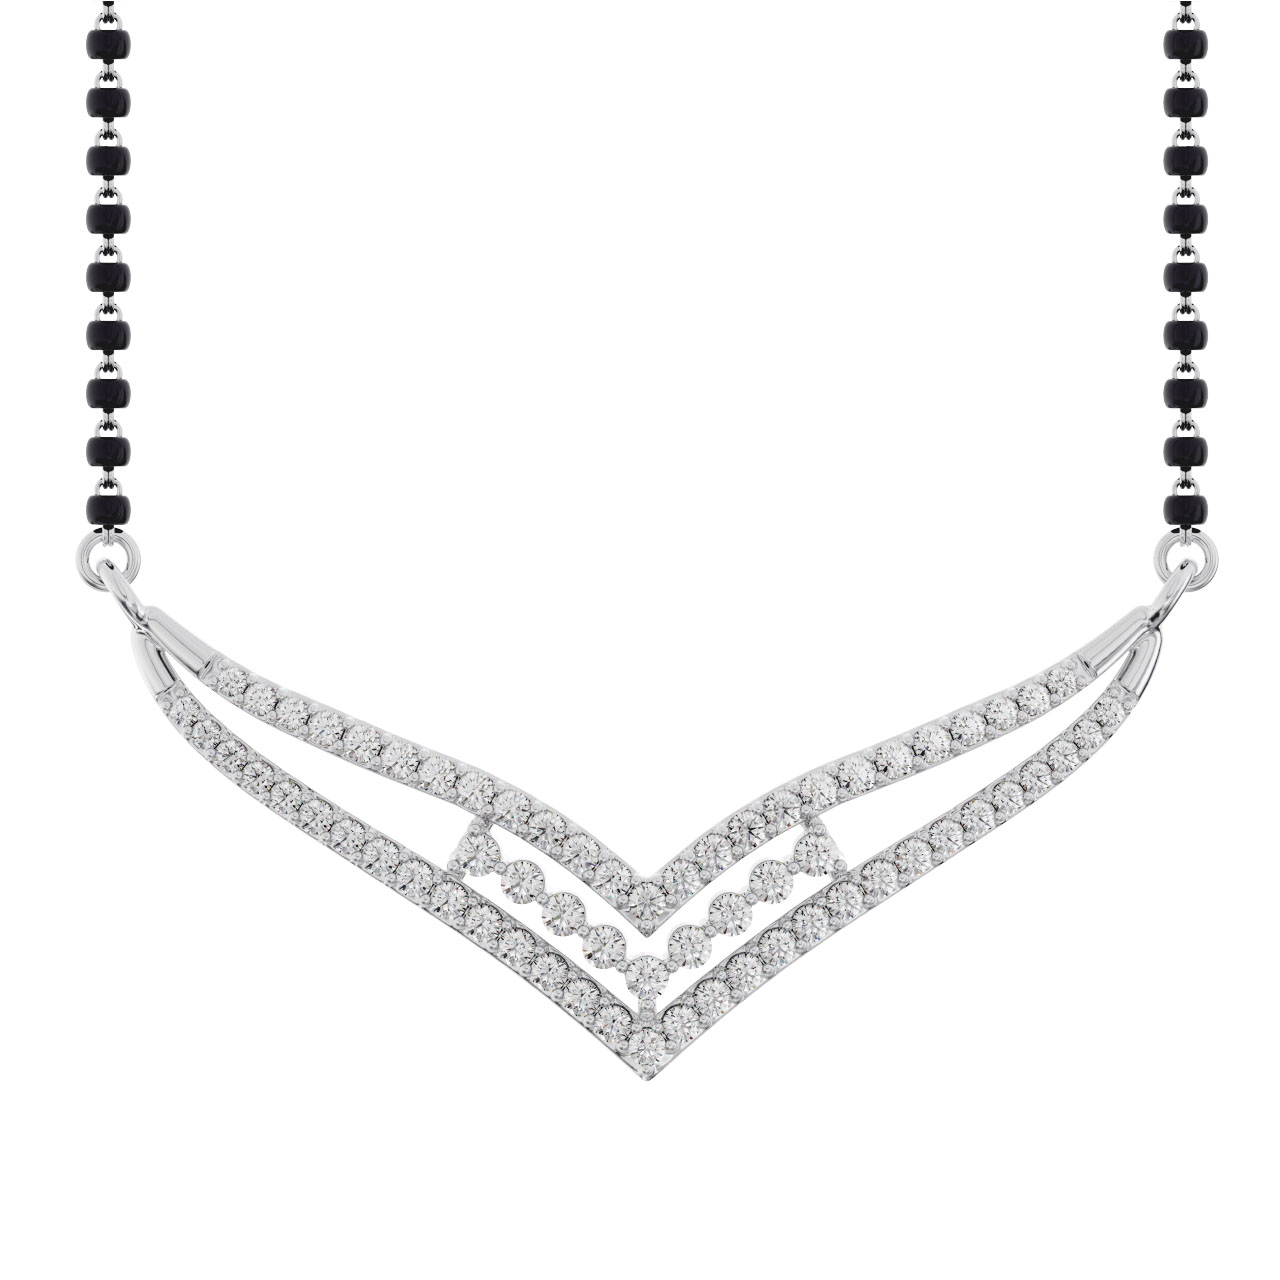 Gold / Platinum Round Cut Diamond Mangalsutra TZ0019